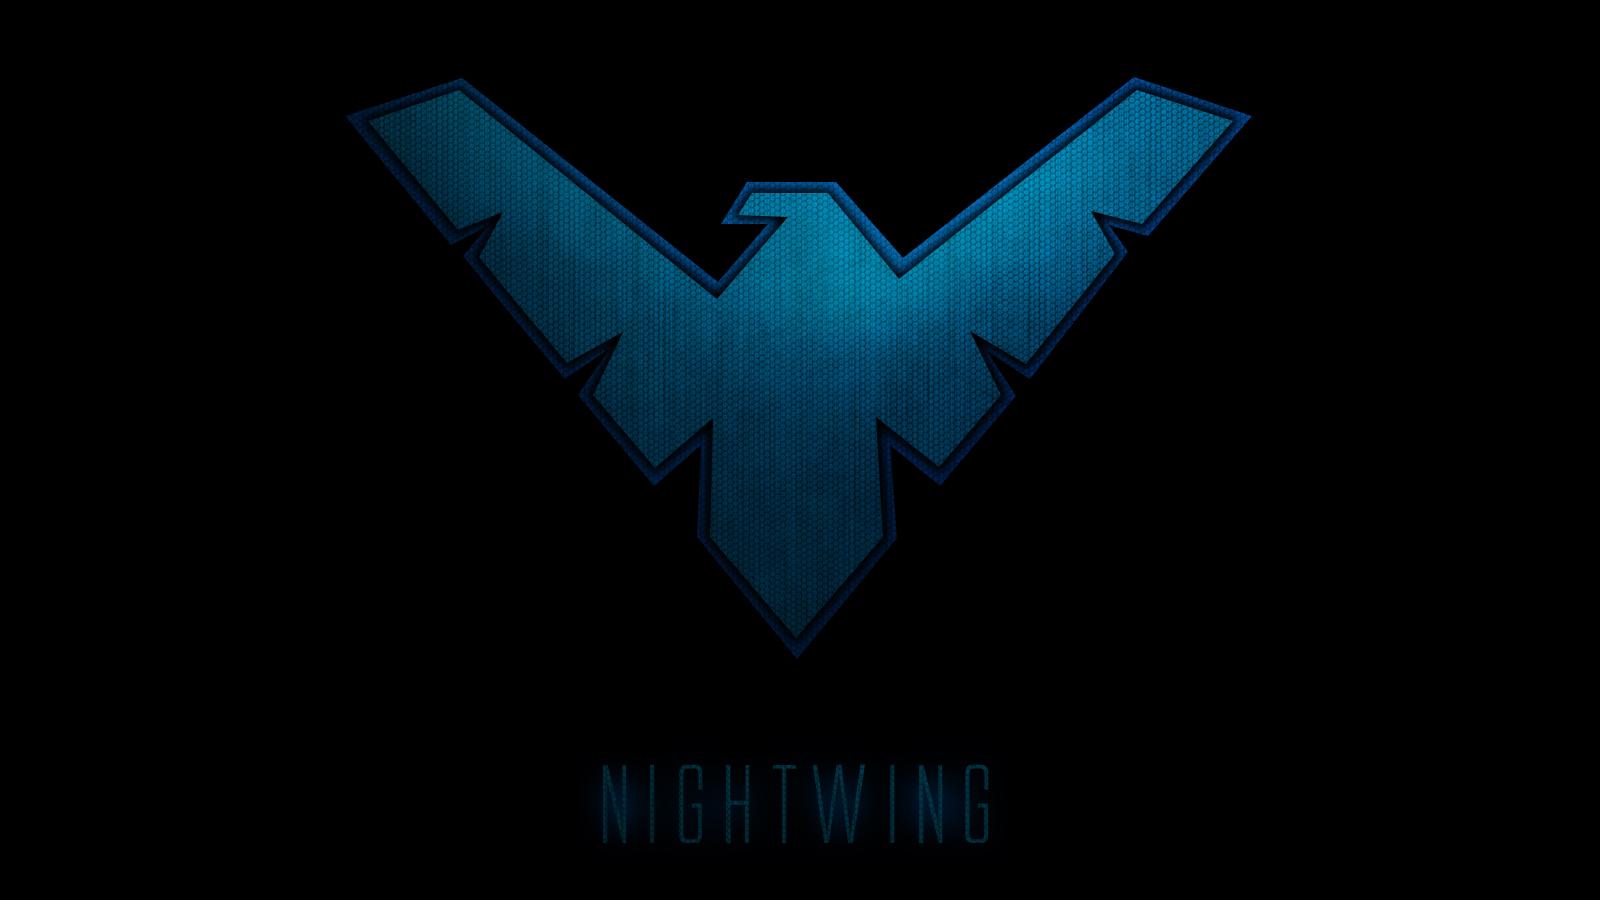 Nightwing Logo 1600x900